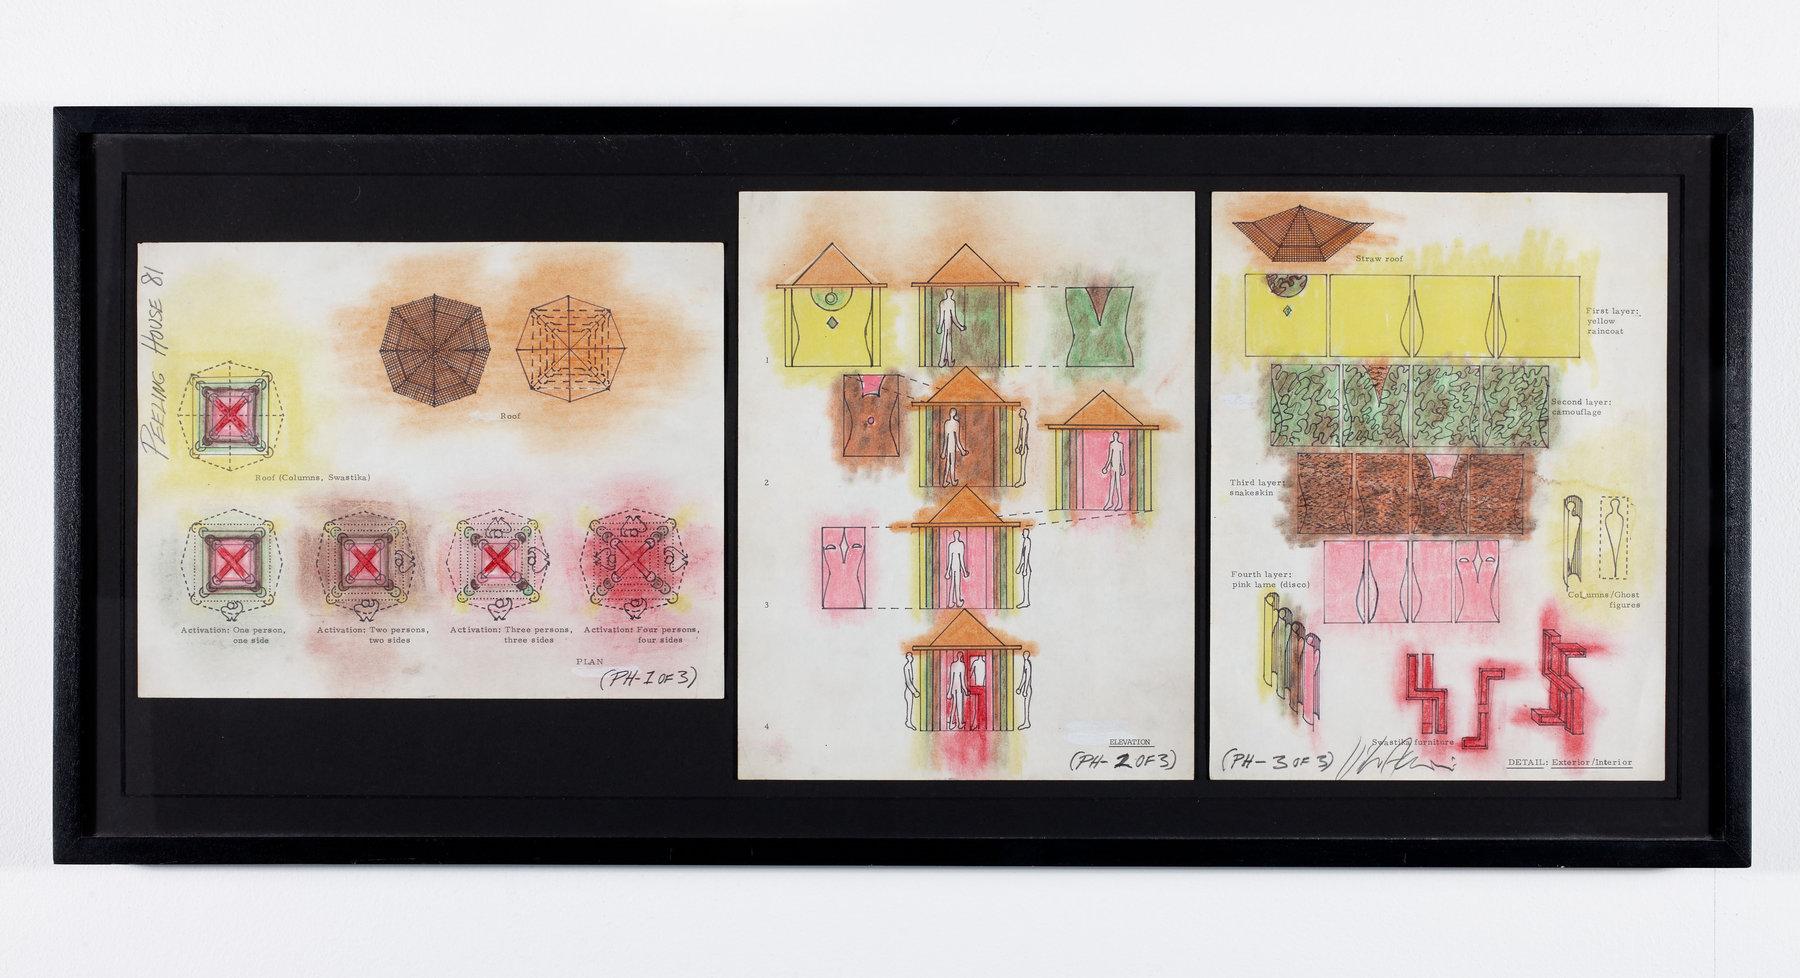 Vito Acconc - Peeling House, 1981